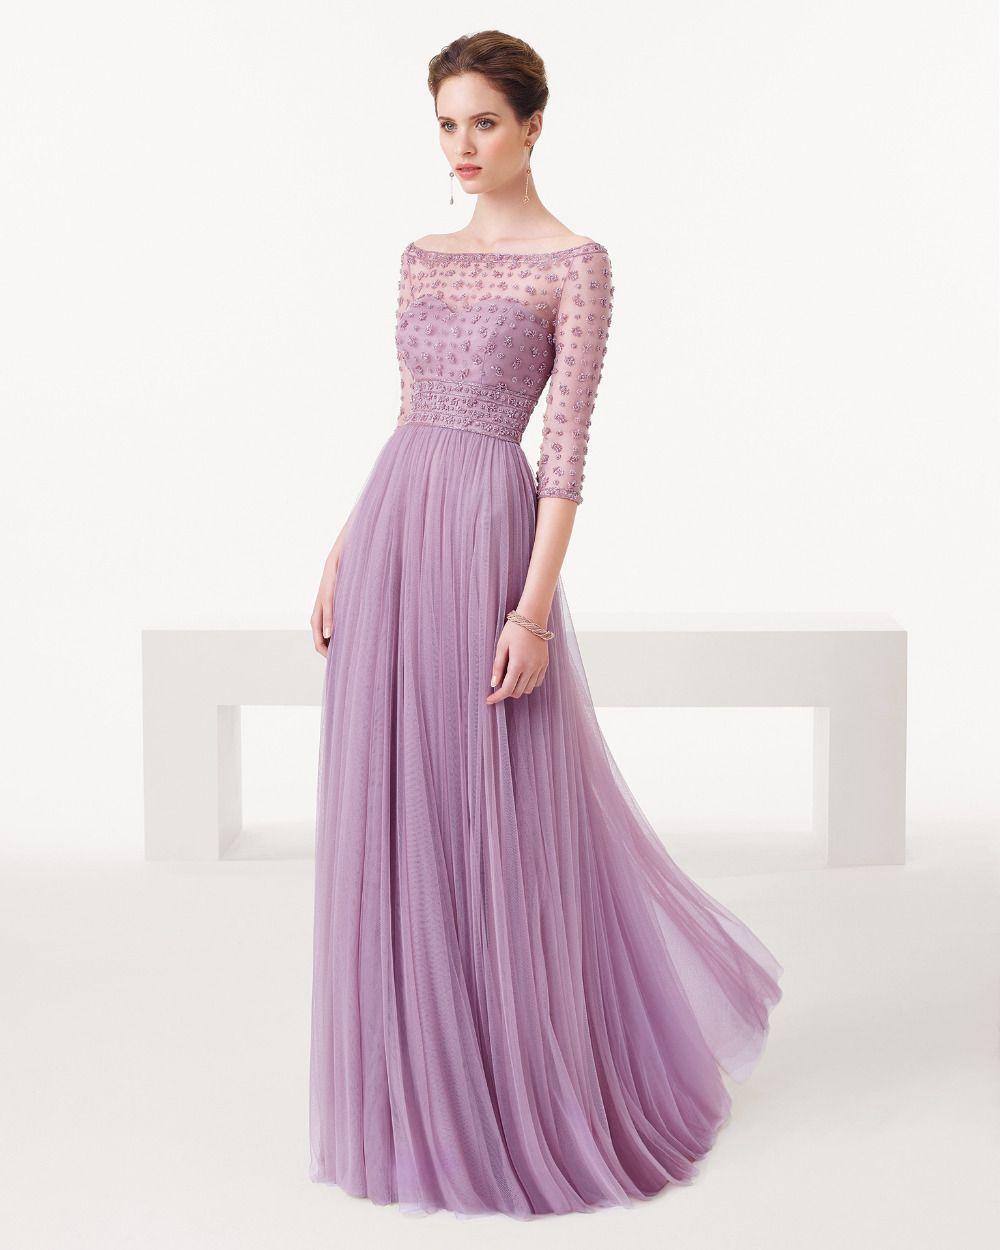 3 quarter evening dresses models | Color dress | Pinterest ...